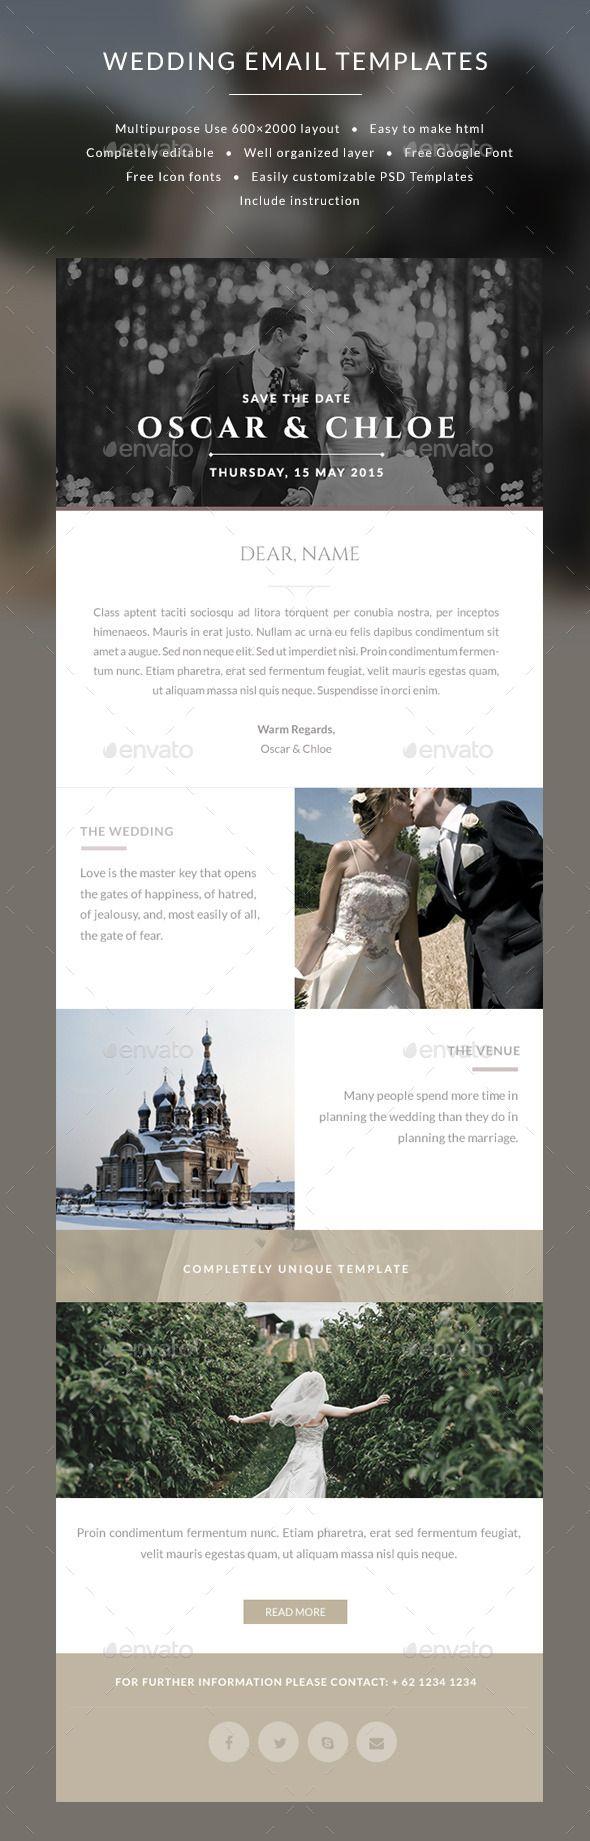 The 25 best email invites ideas on pinterest email net disney email wedding invitation templates oscar stopboris Images